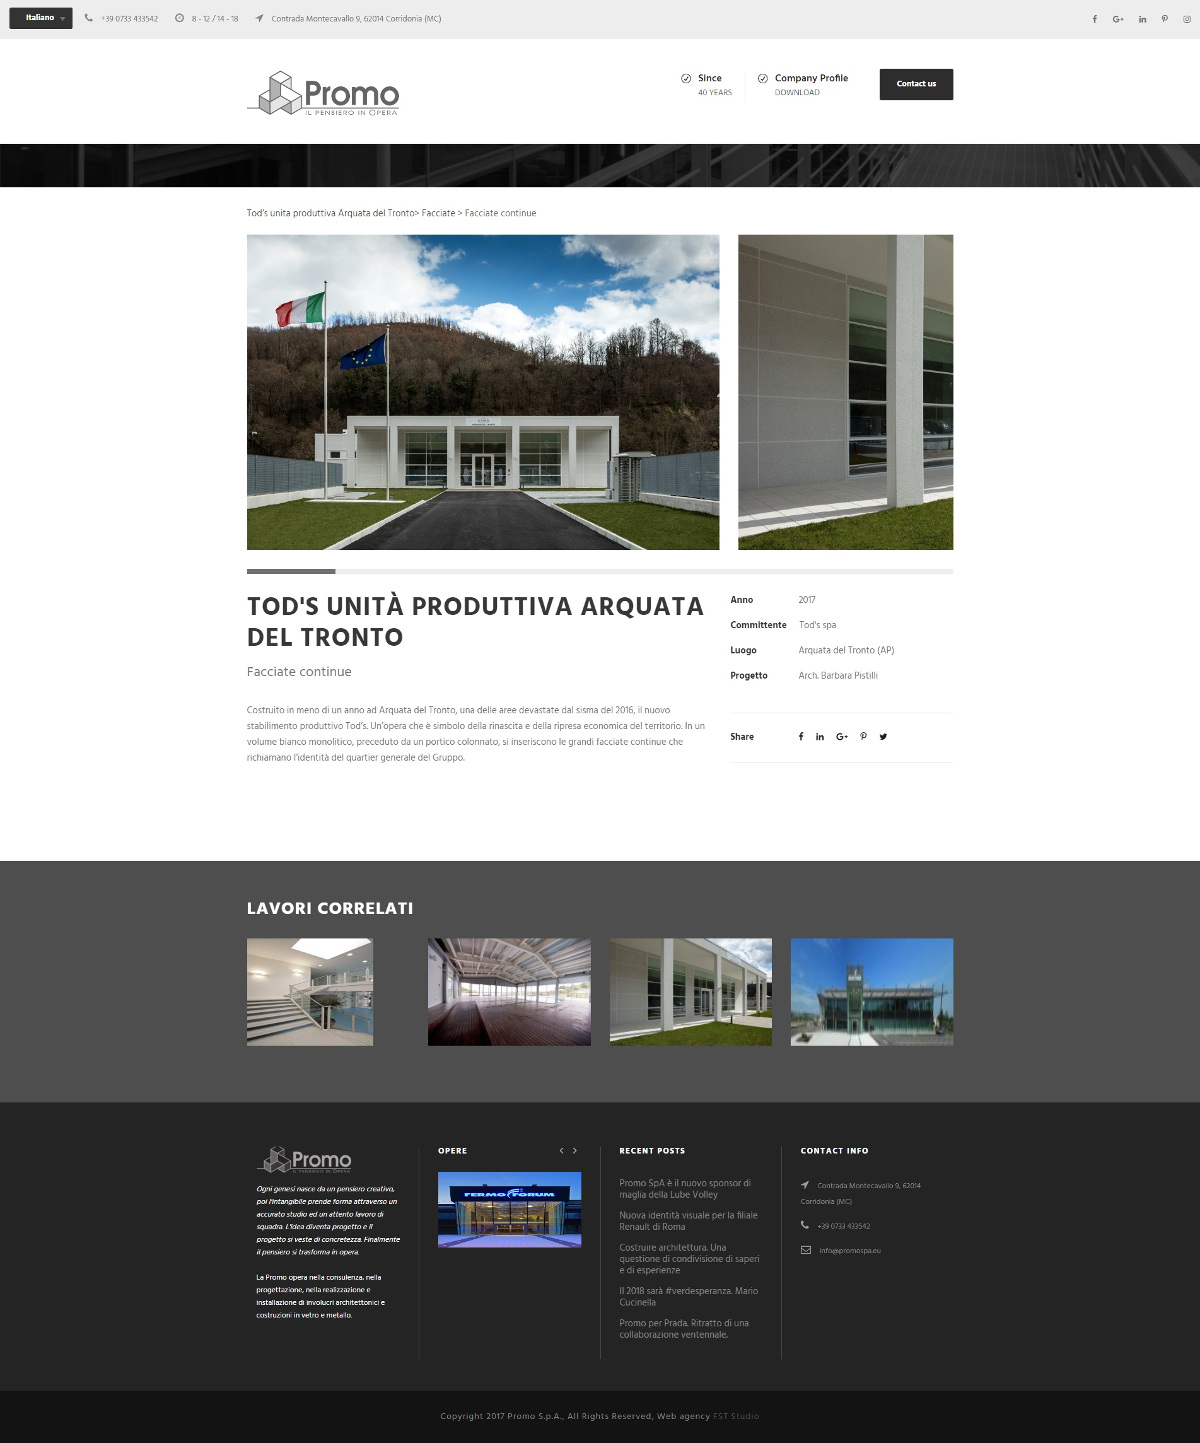 screenshot-promo_singololavoro_portfolio_fst1200